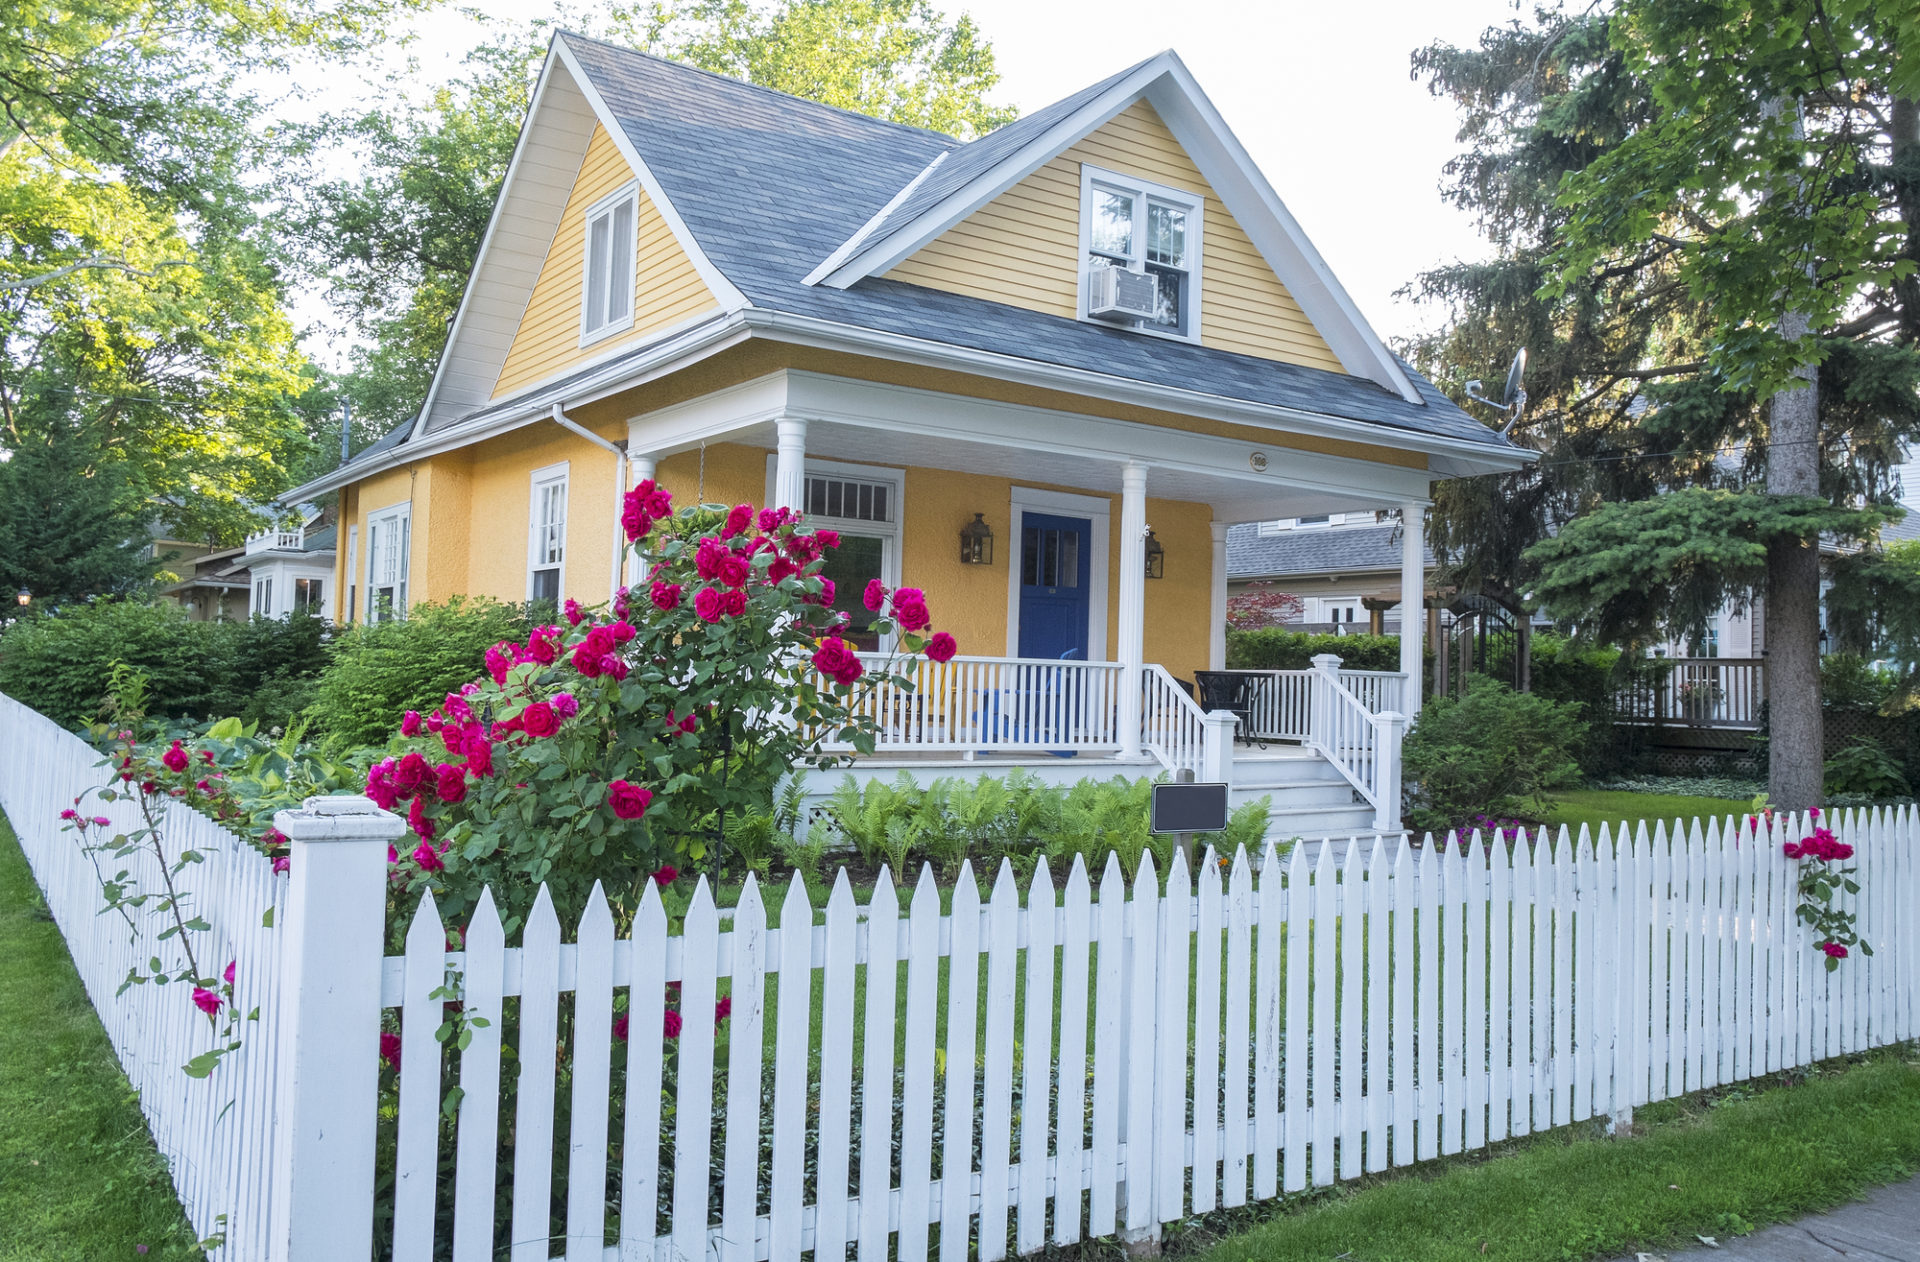 Fence Painting Company in Blacksburg VA